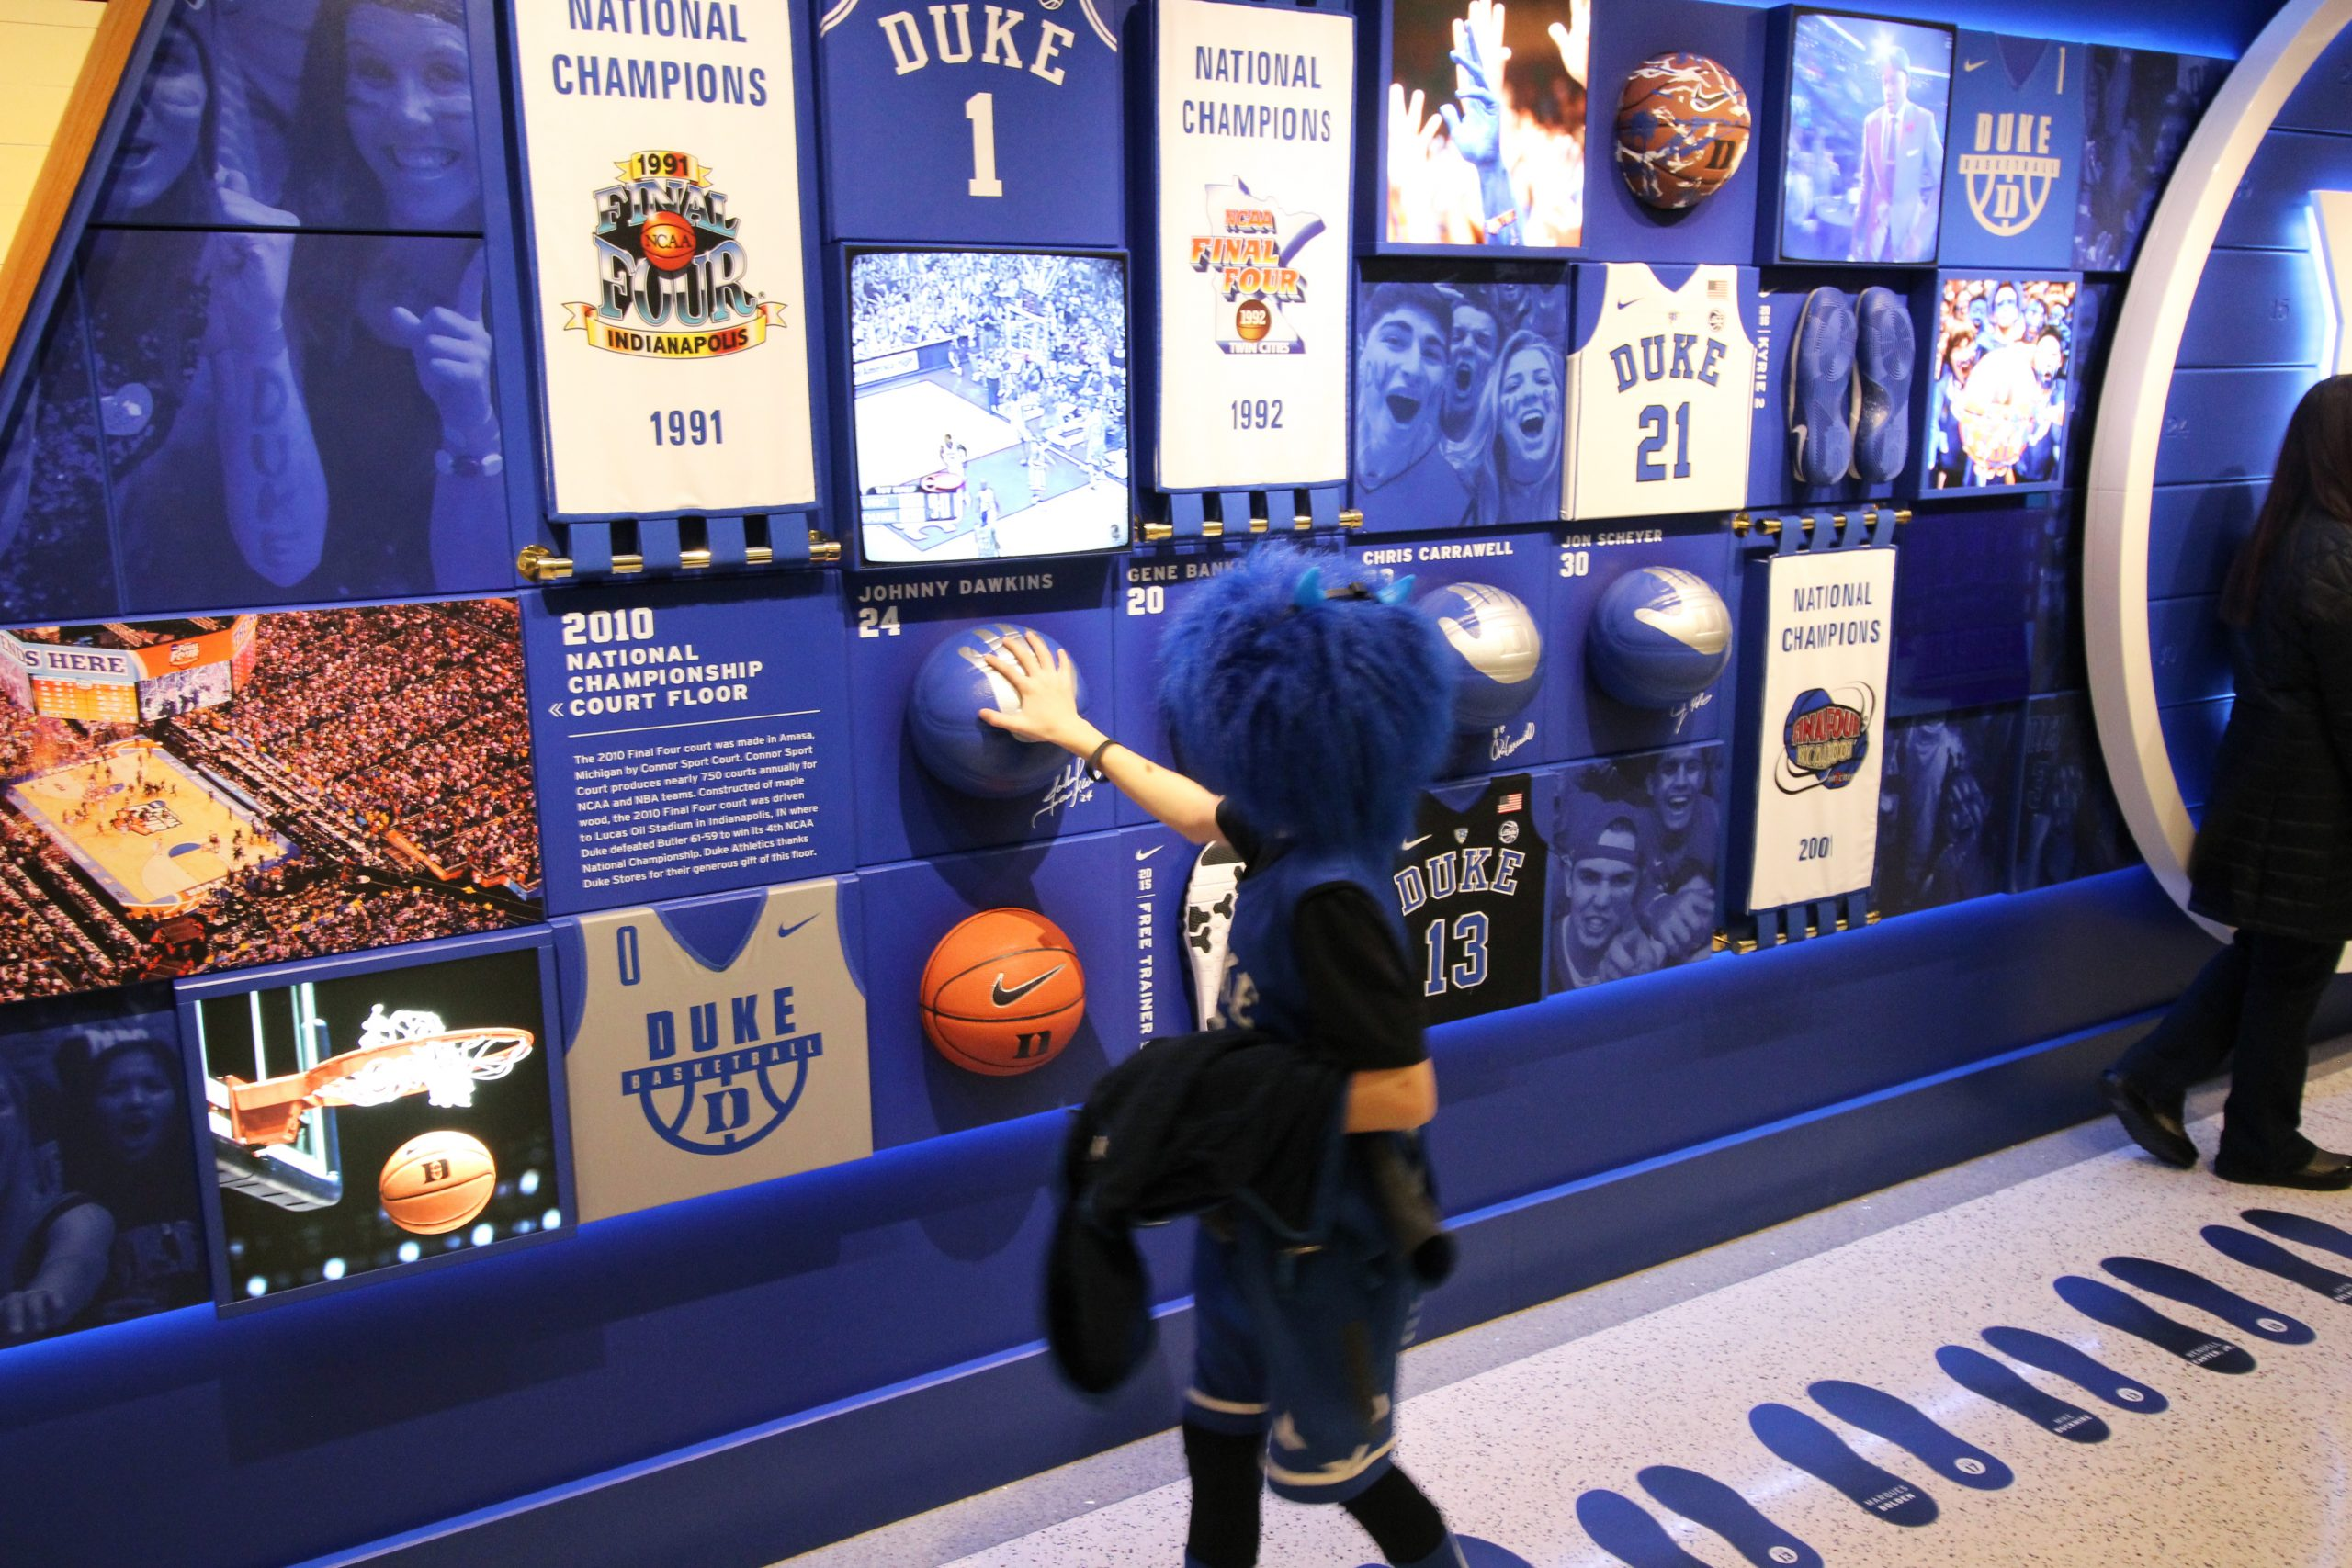 Duke Basketball – Cameron Crazies Wall